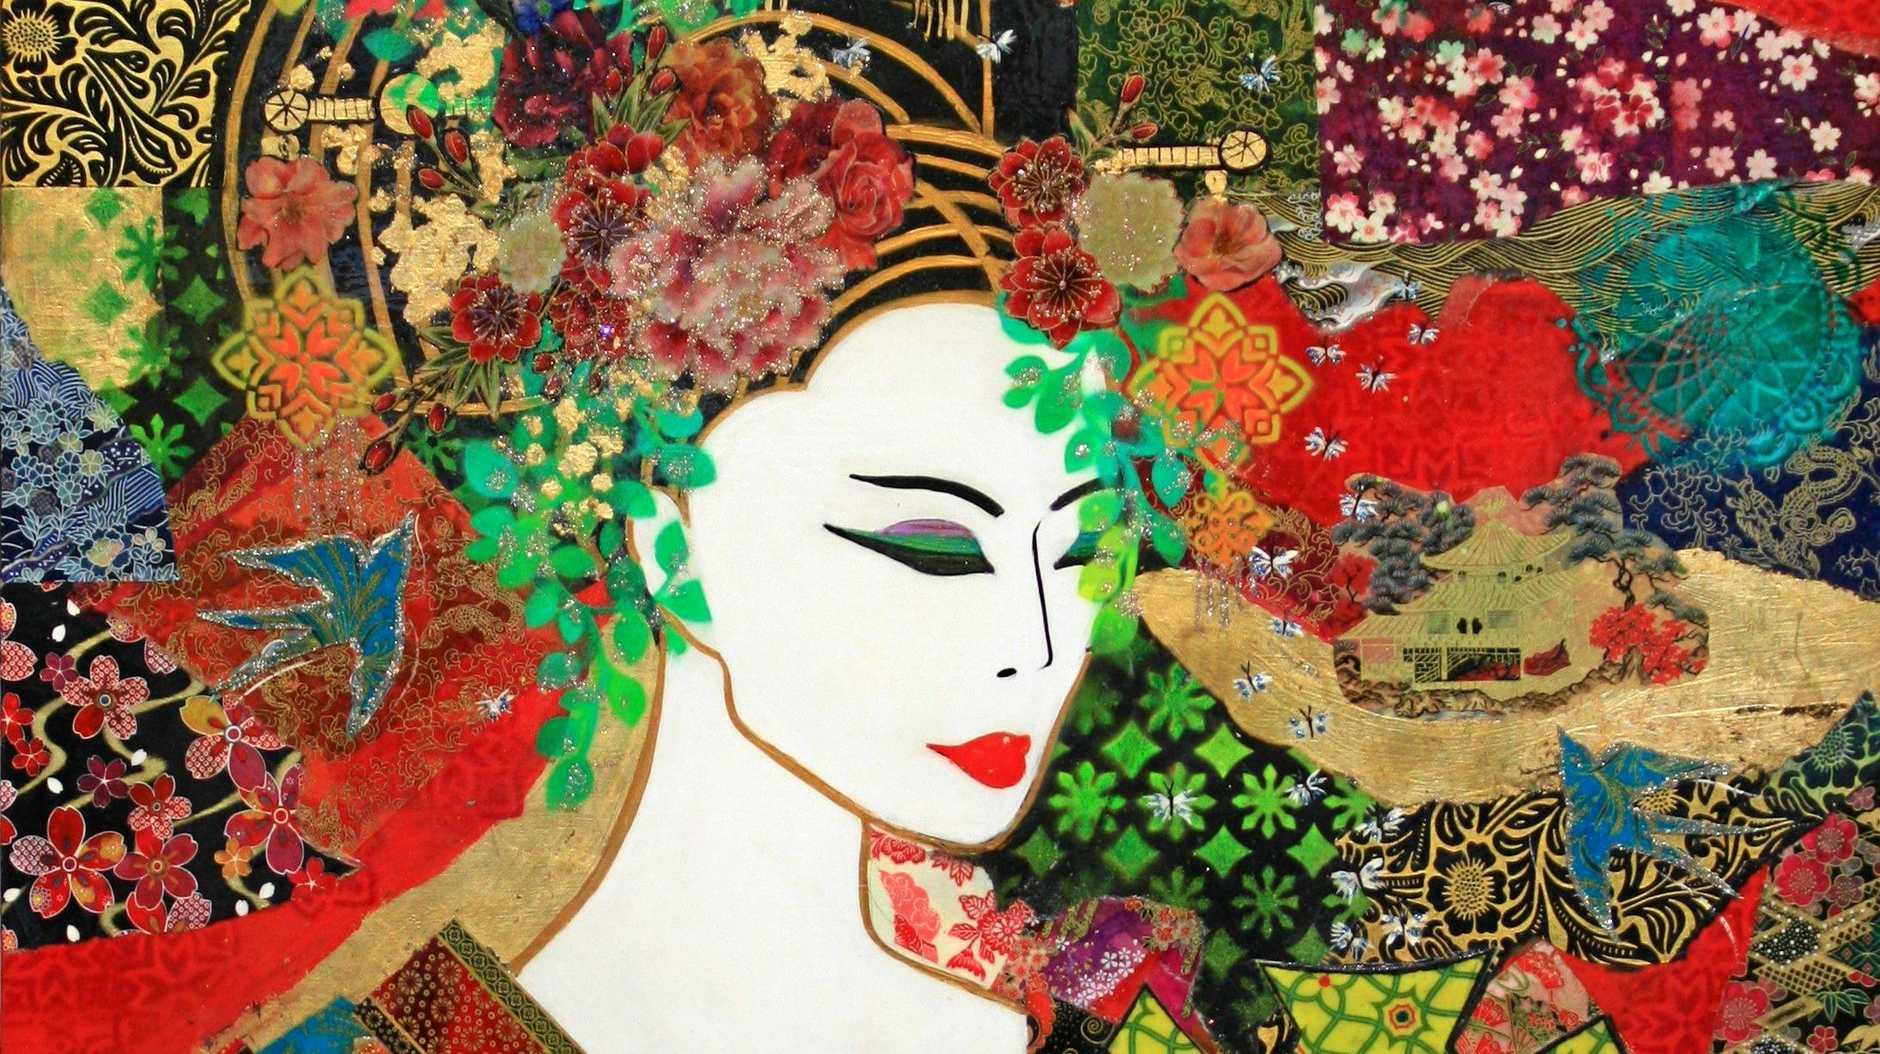 Montville Art Gallery has Kendall's The Magic Kimono.